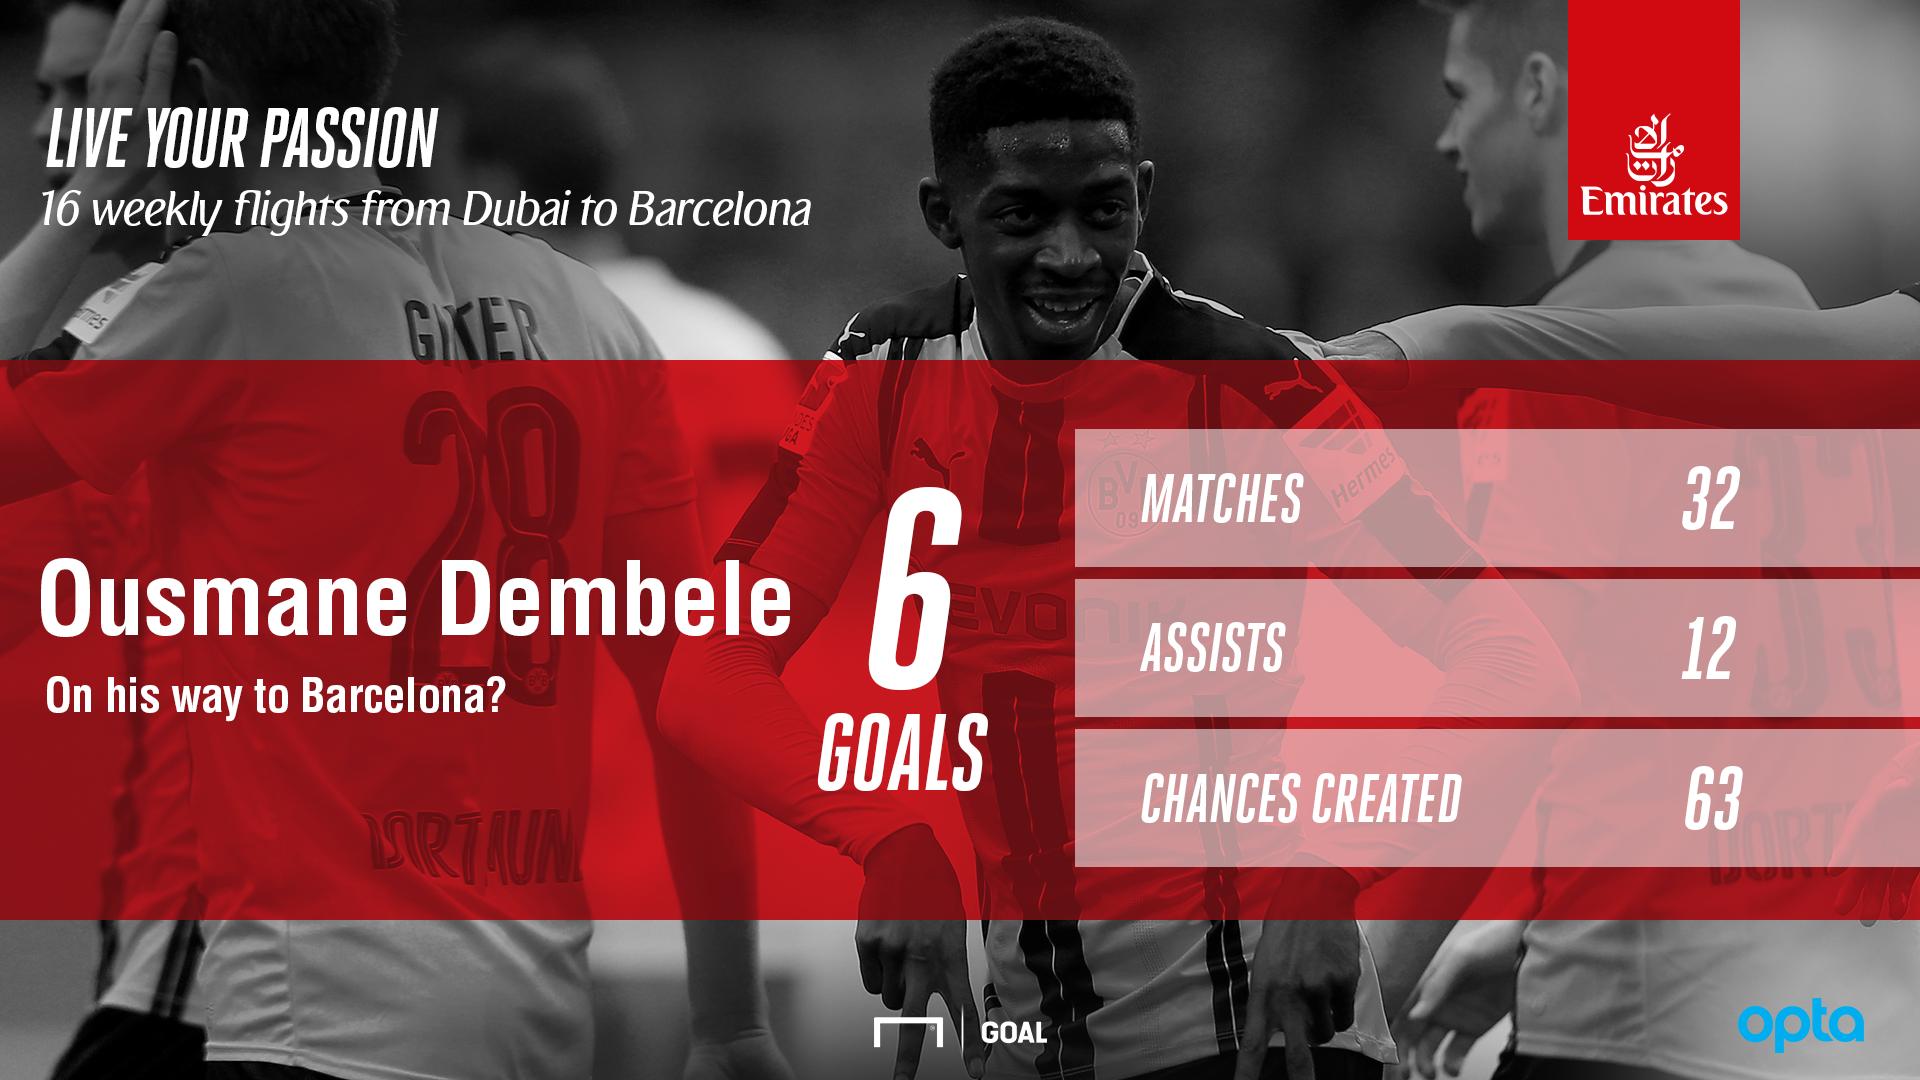 EN Oussmane Dembele - Emirates